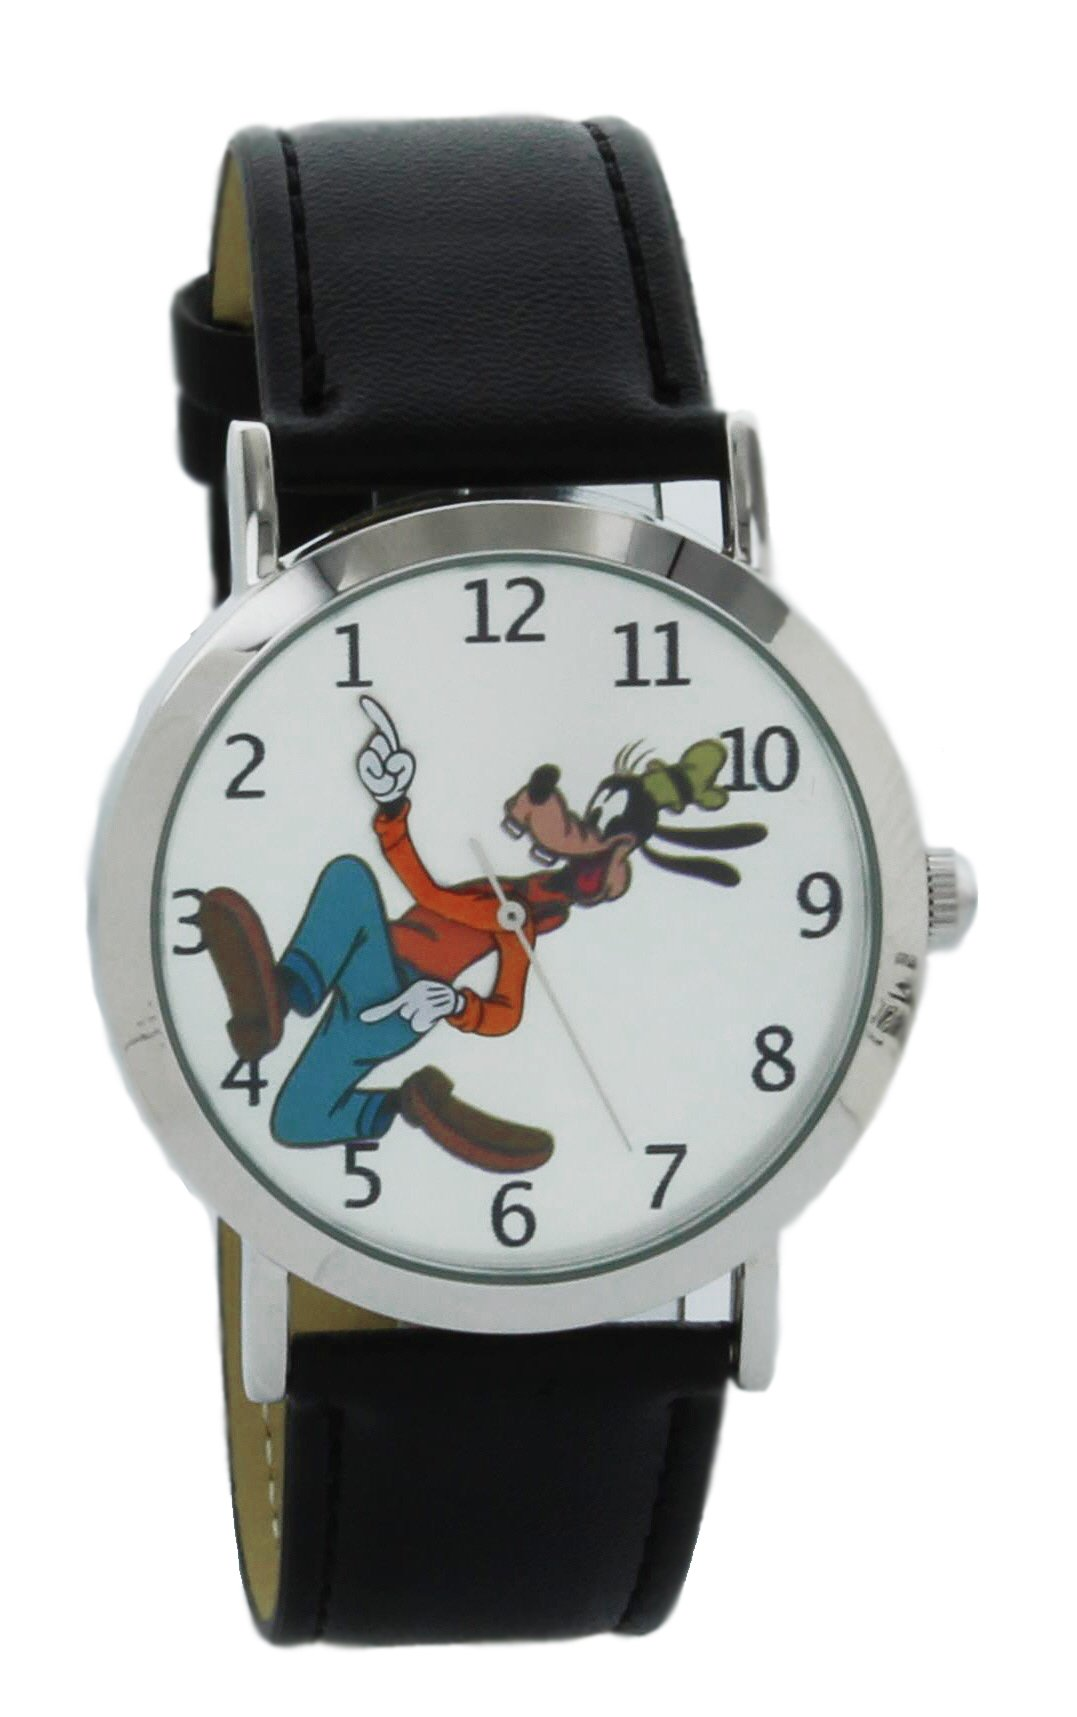 Disney Vintage style backward ticking watch Goofy Molded Hand Quartz watch GFY002